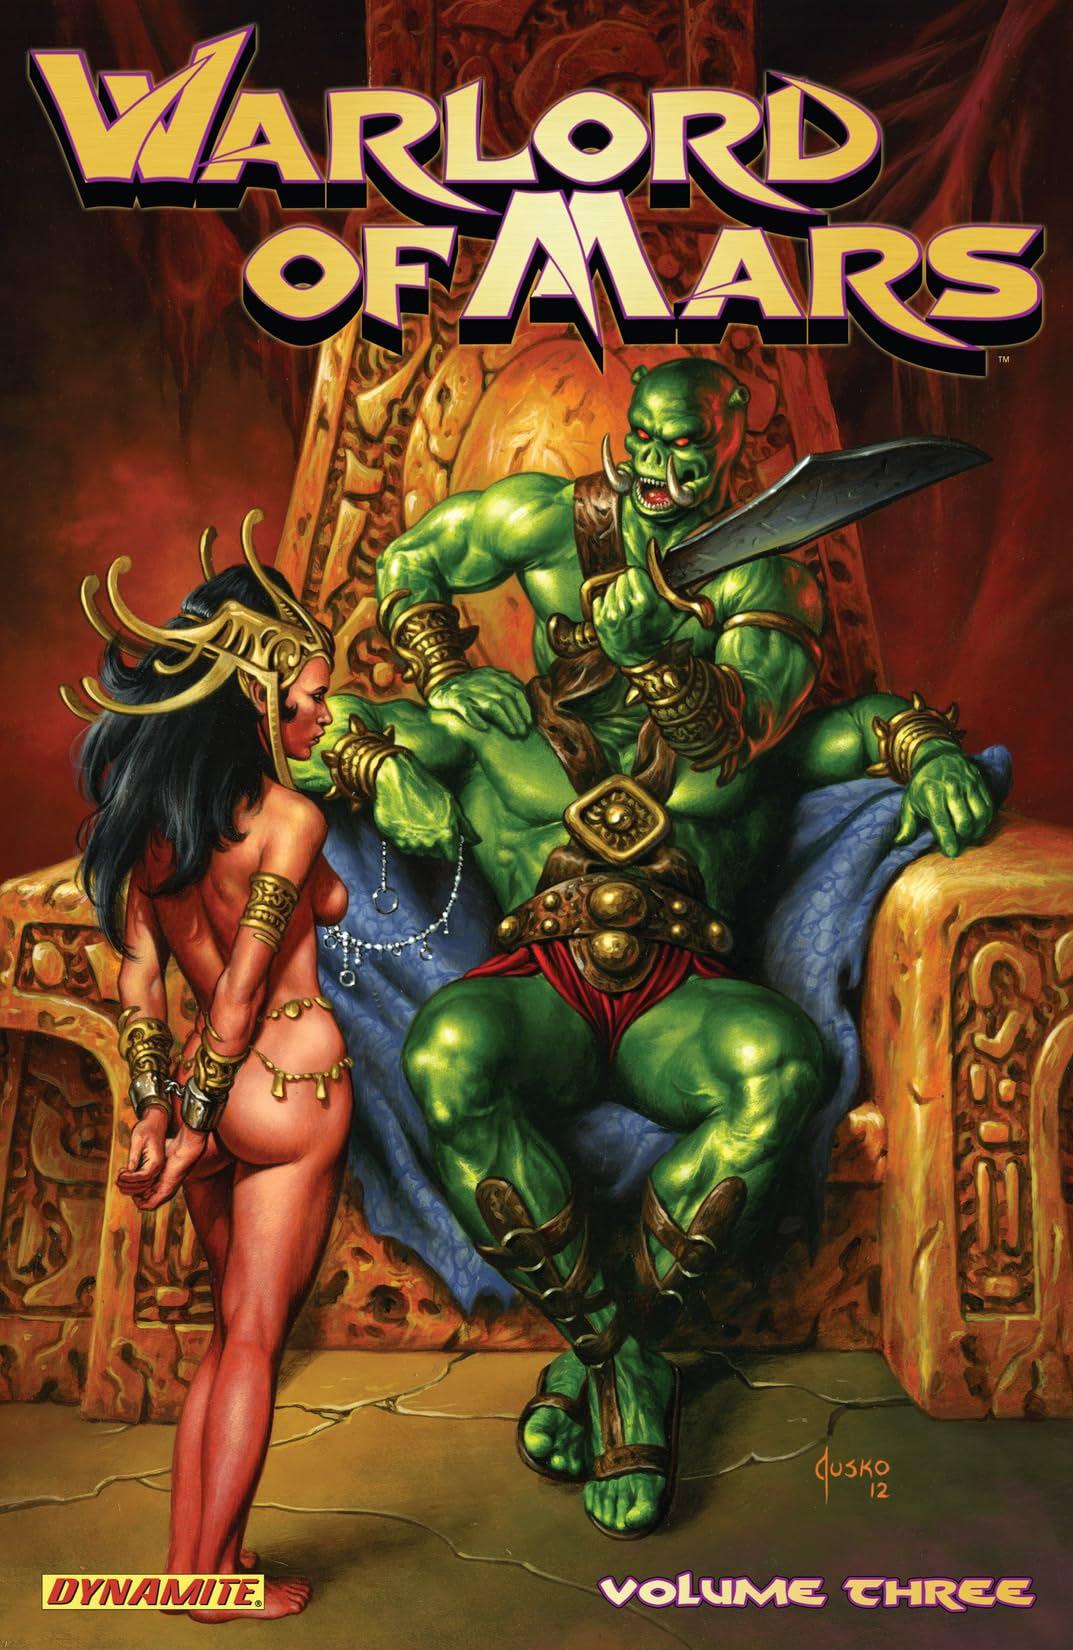 Warlord of Mars Vol. 3